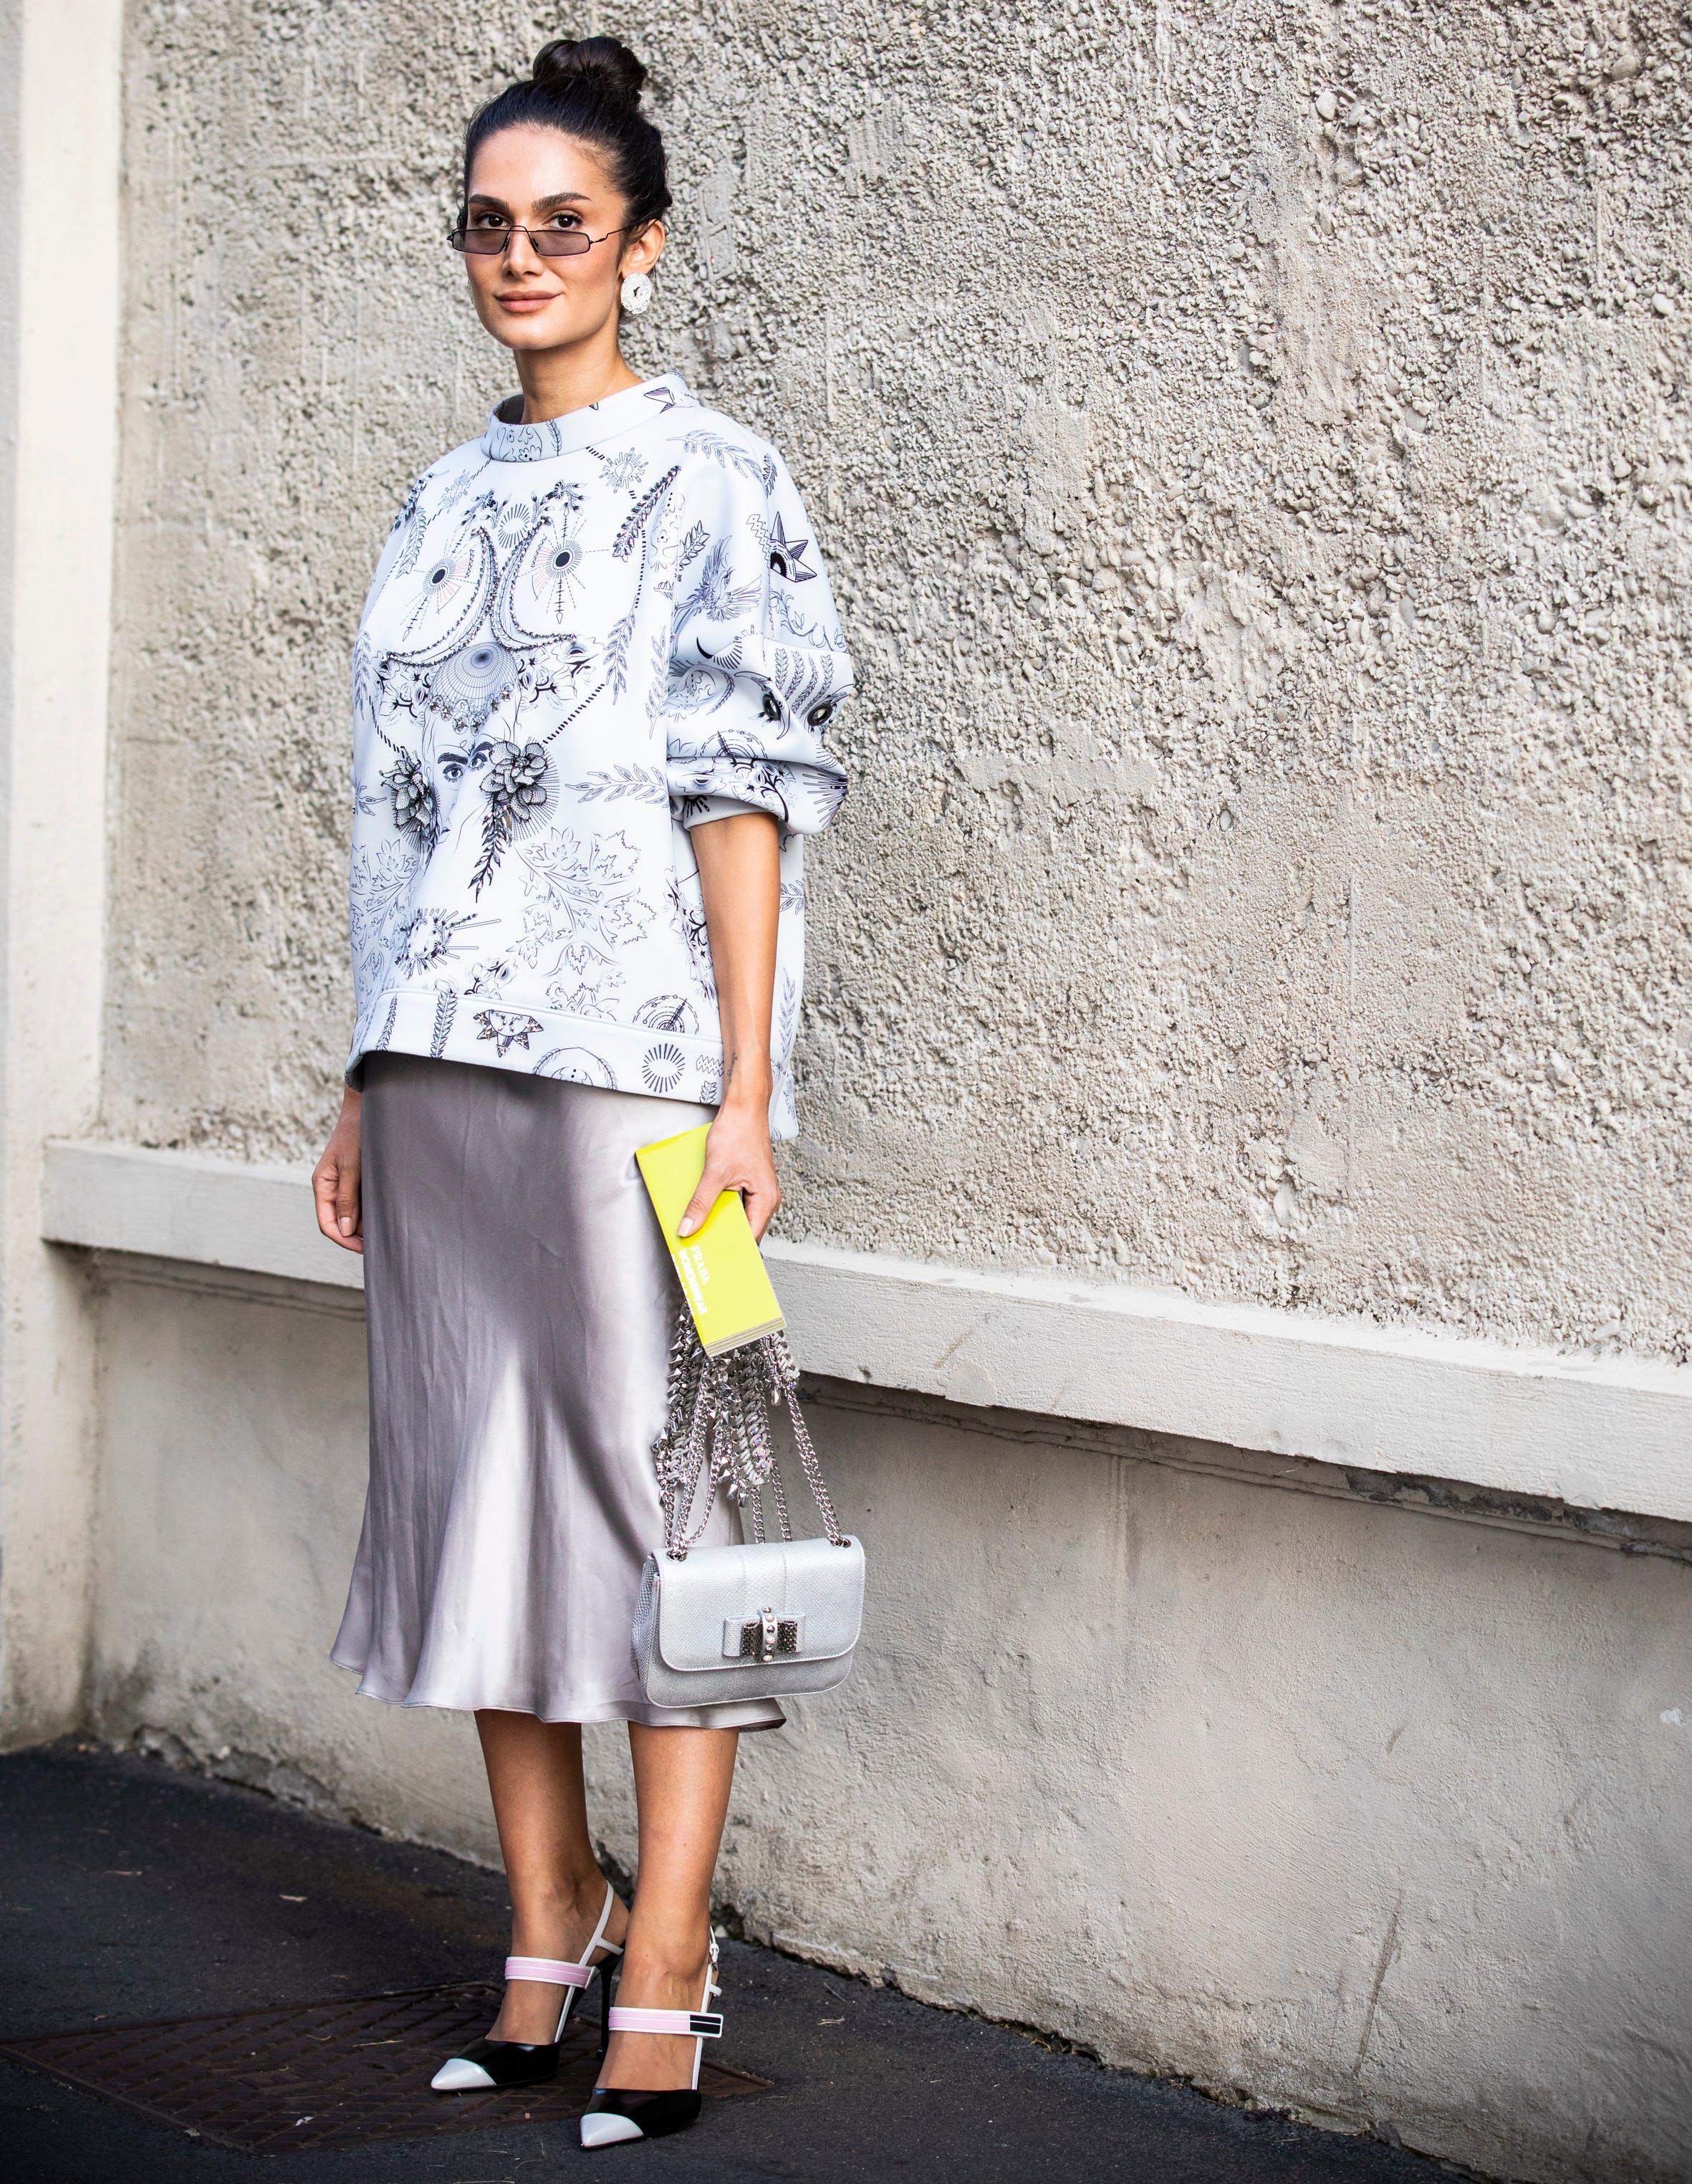 woman wearing satin skirt and sweatshirt with heels